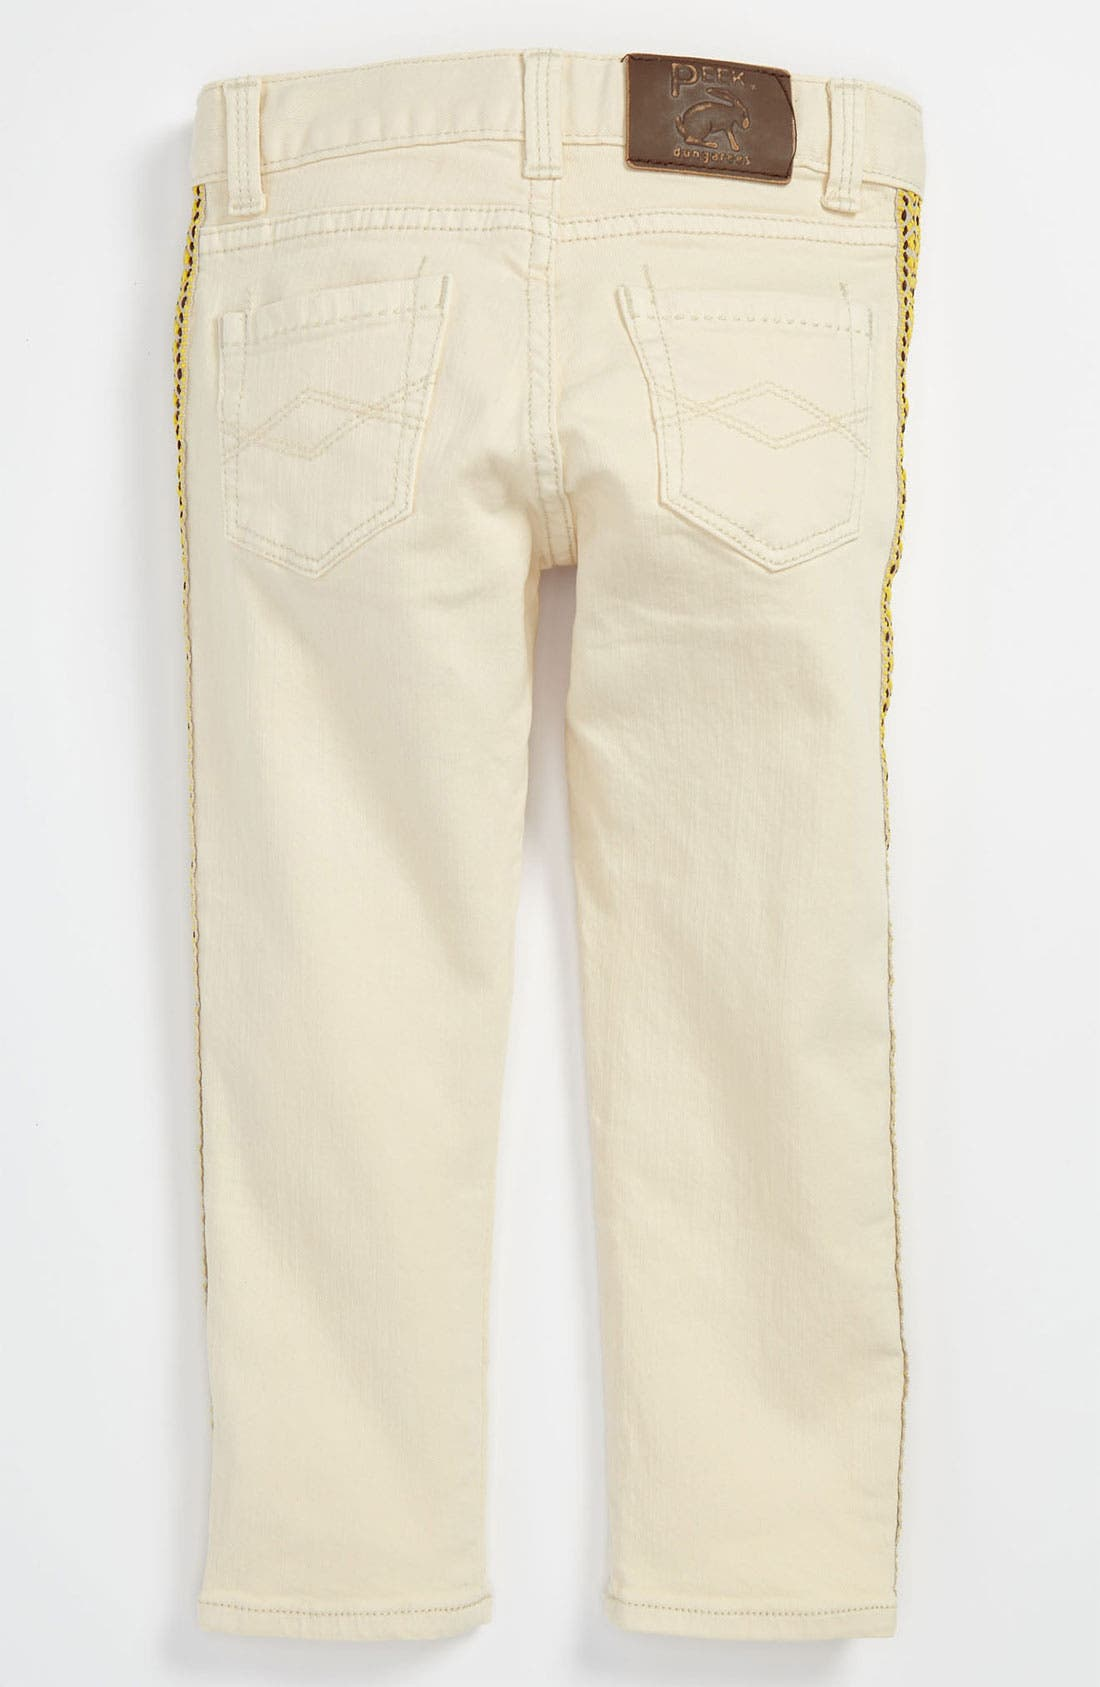 Alternate Image 1 Selected - Peek 'Nicole' Jeans (Toddler, Little Girls & Big Girls)